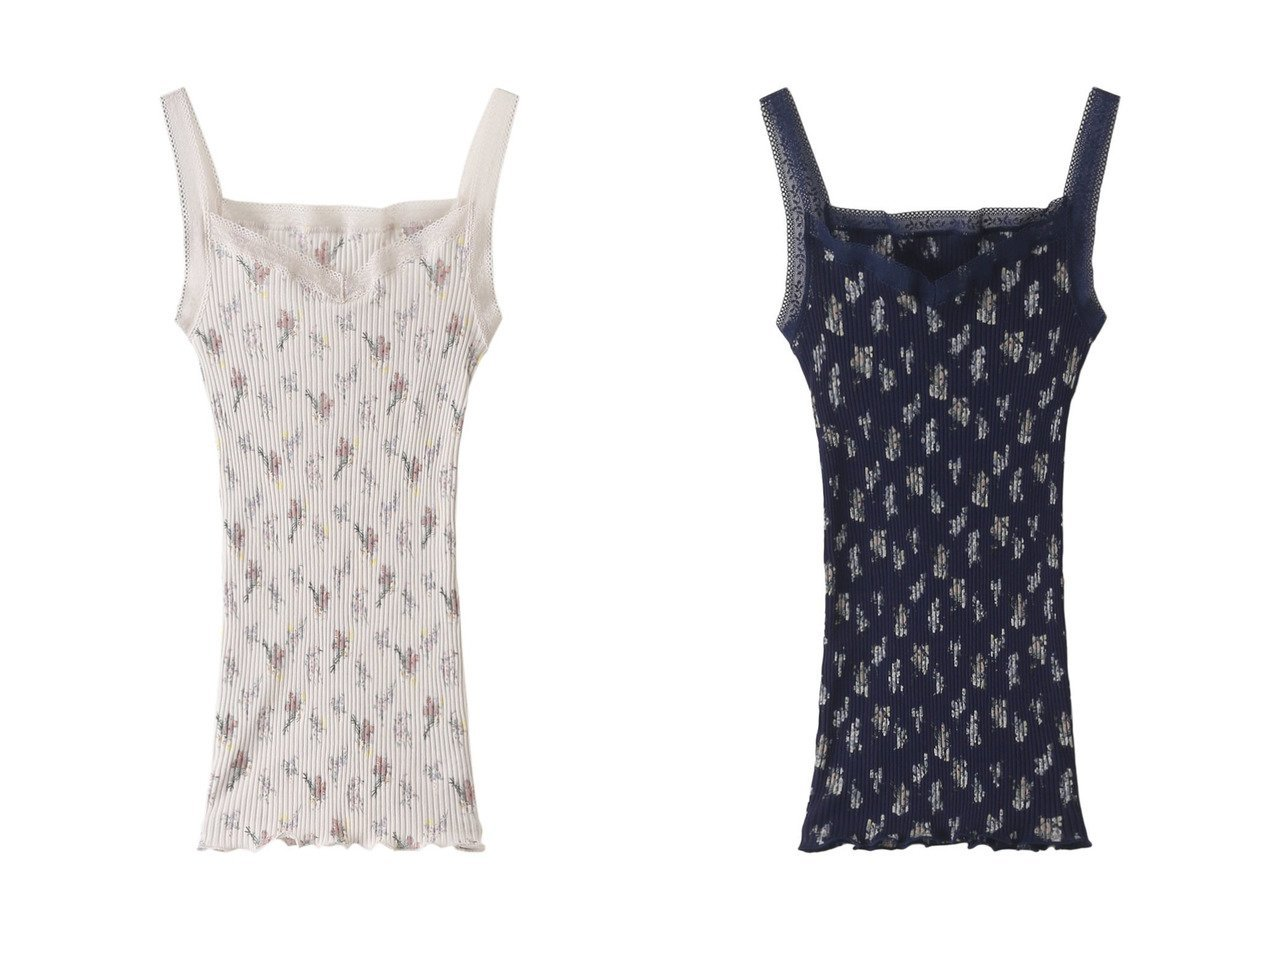 【KID BLUE/キッドブルー】のライラックブーケキャミソール 【お家時間 ルームウェア】おすすめ!人気、トレンド・レディースファッションの通販  おすすめファッション通販アイテム インテリア・キッズ・メンズ・レディースファッション・服の通販 founy(ファニー)  ファッション Fashion レディースファッション WOMEN トップス・カットソー Tops/Tshirt キャミソール / ノースリーブ No Sleeves インナー キャミソール トリミング フィット フェミニン プリント ラップ レース ベージュ系 Beige ブルー系 Blue |ID:crp329100000029823